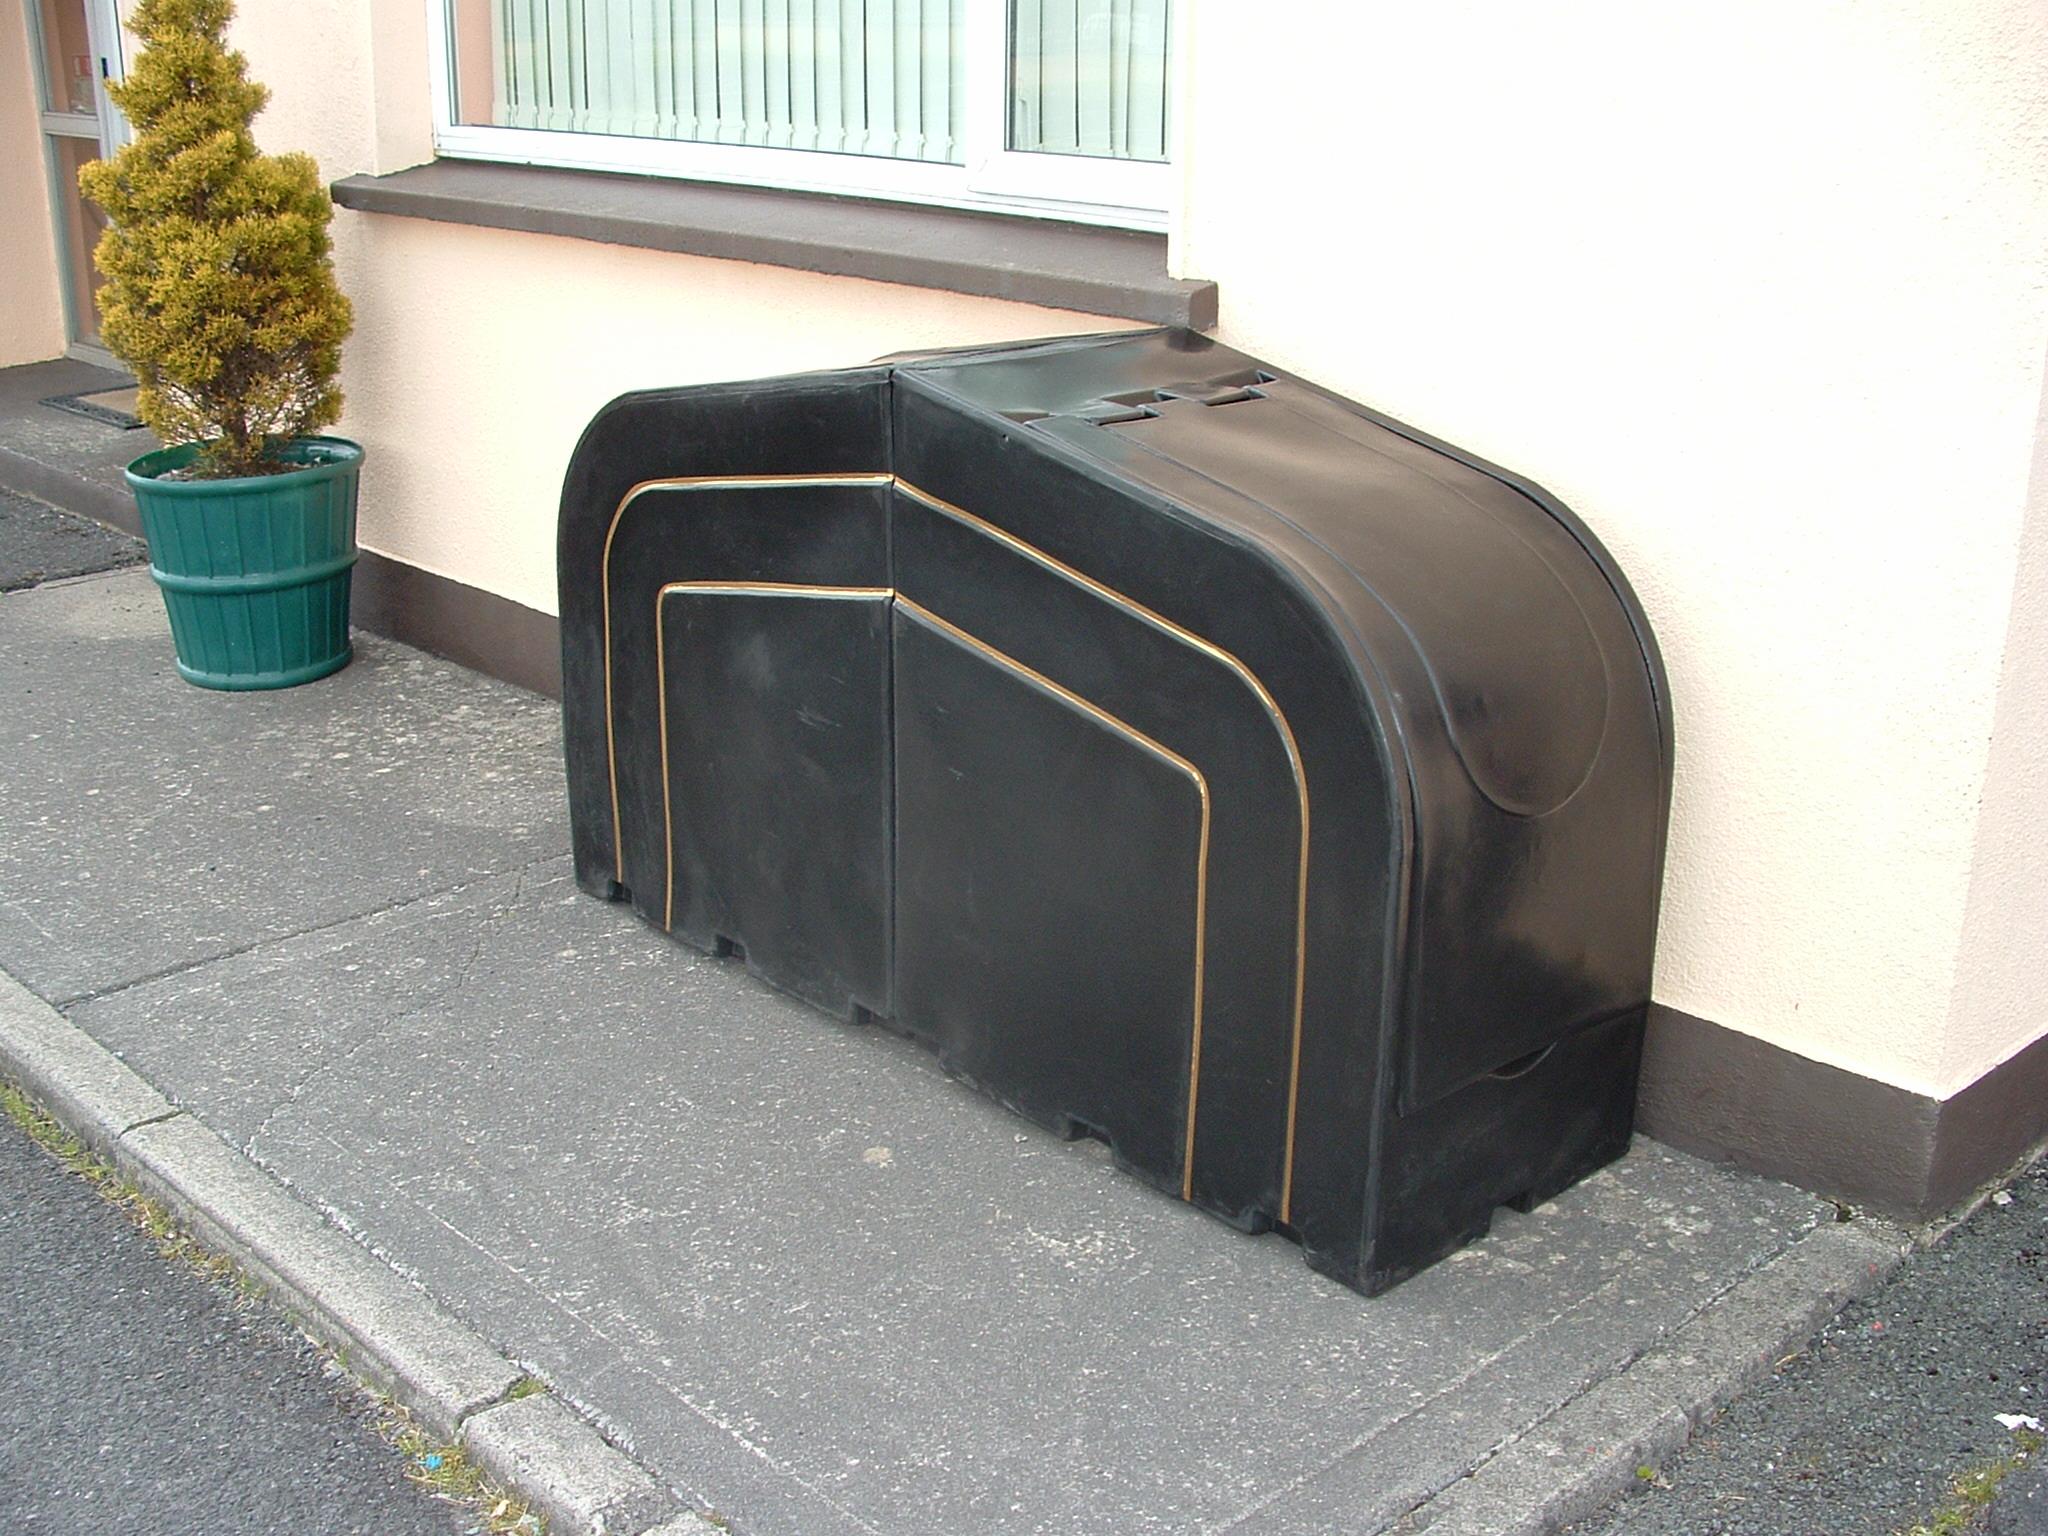 Newspaper storage unit